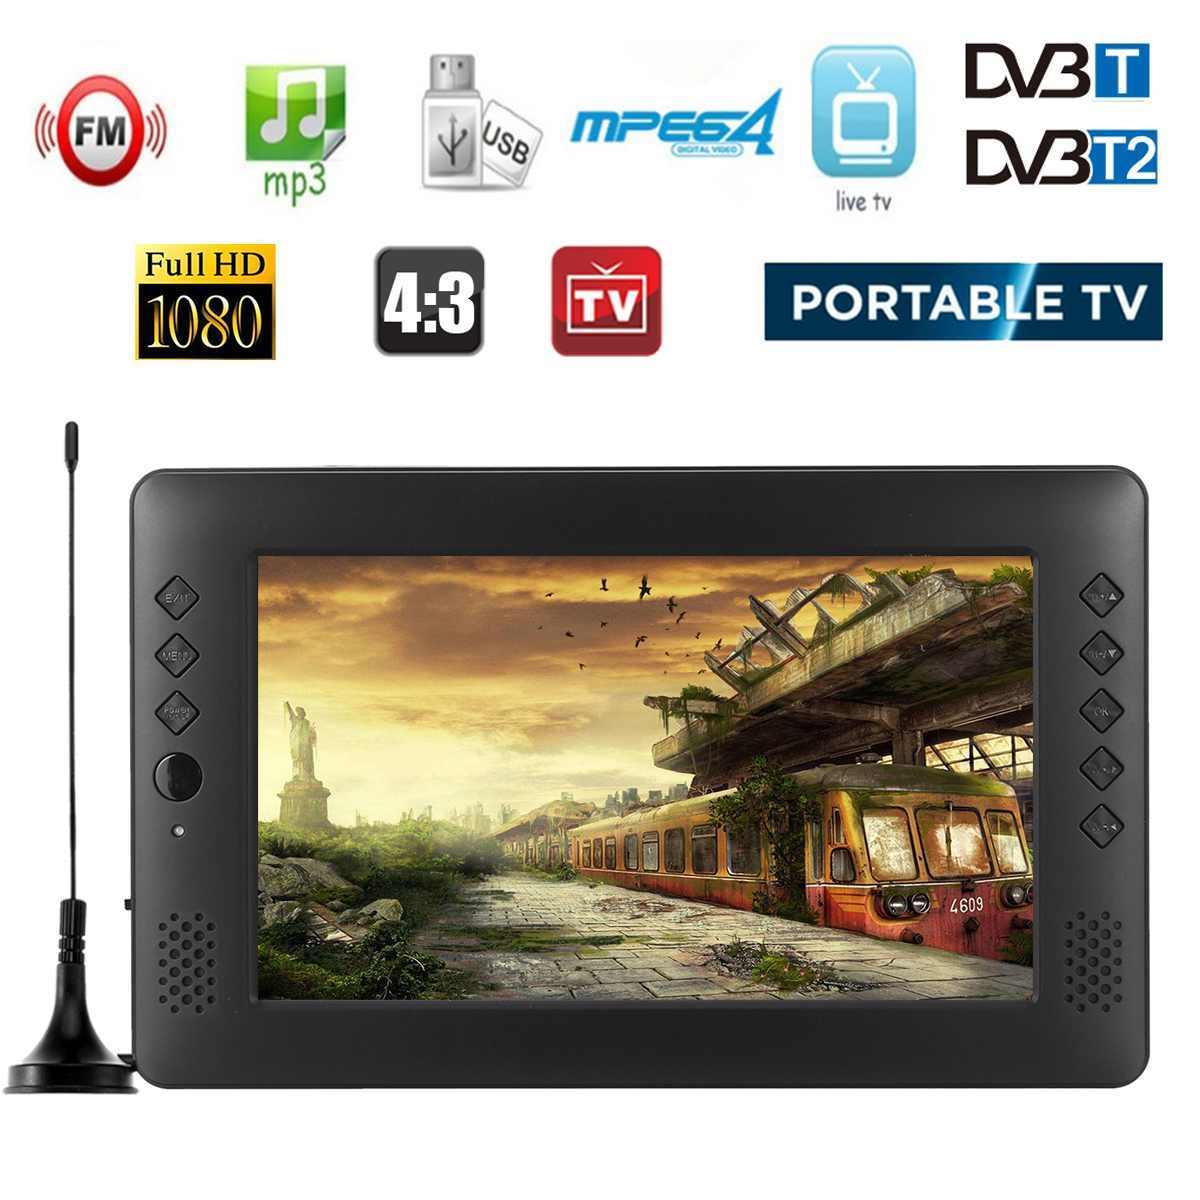 12V 9 inch Portable Mini WiFi Digital and Analog TV HD DVB-T2 DVB-T DTV ATV Car Smart Television Support USB TF Card MP4 MP3